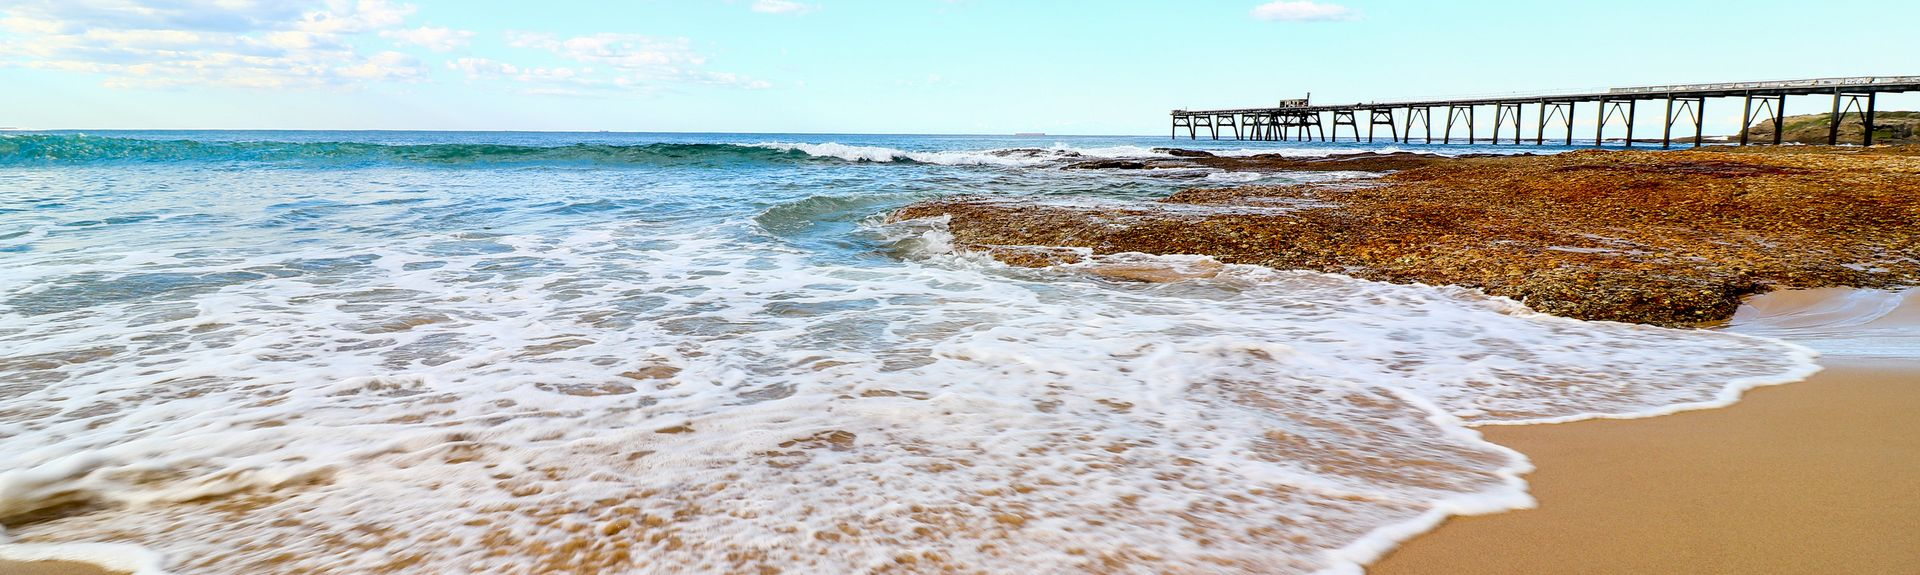 Fishing Point, Nova Gales do Sul, Austrália